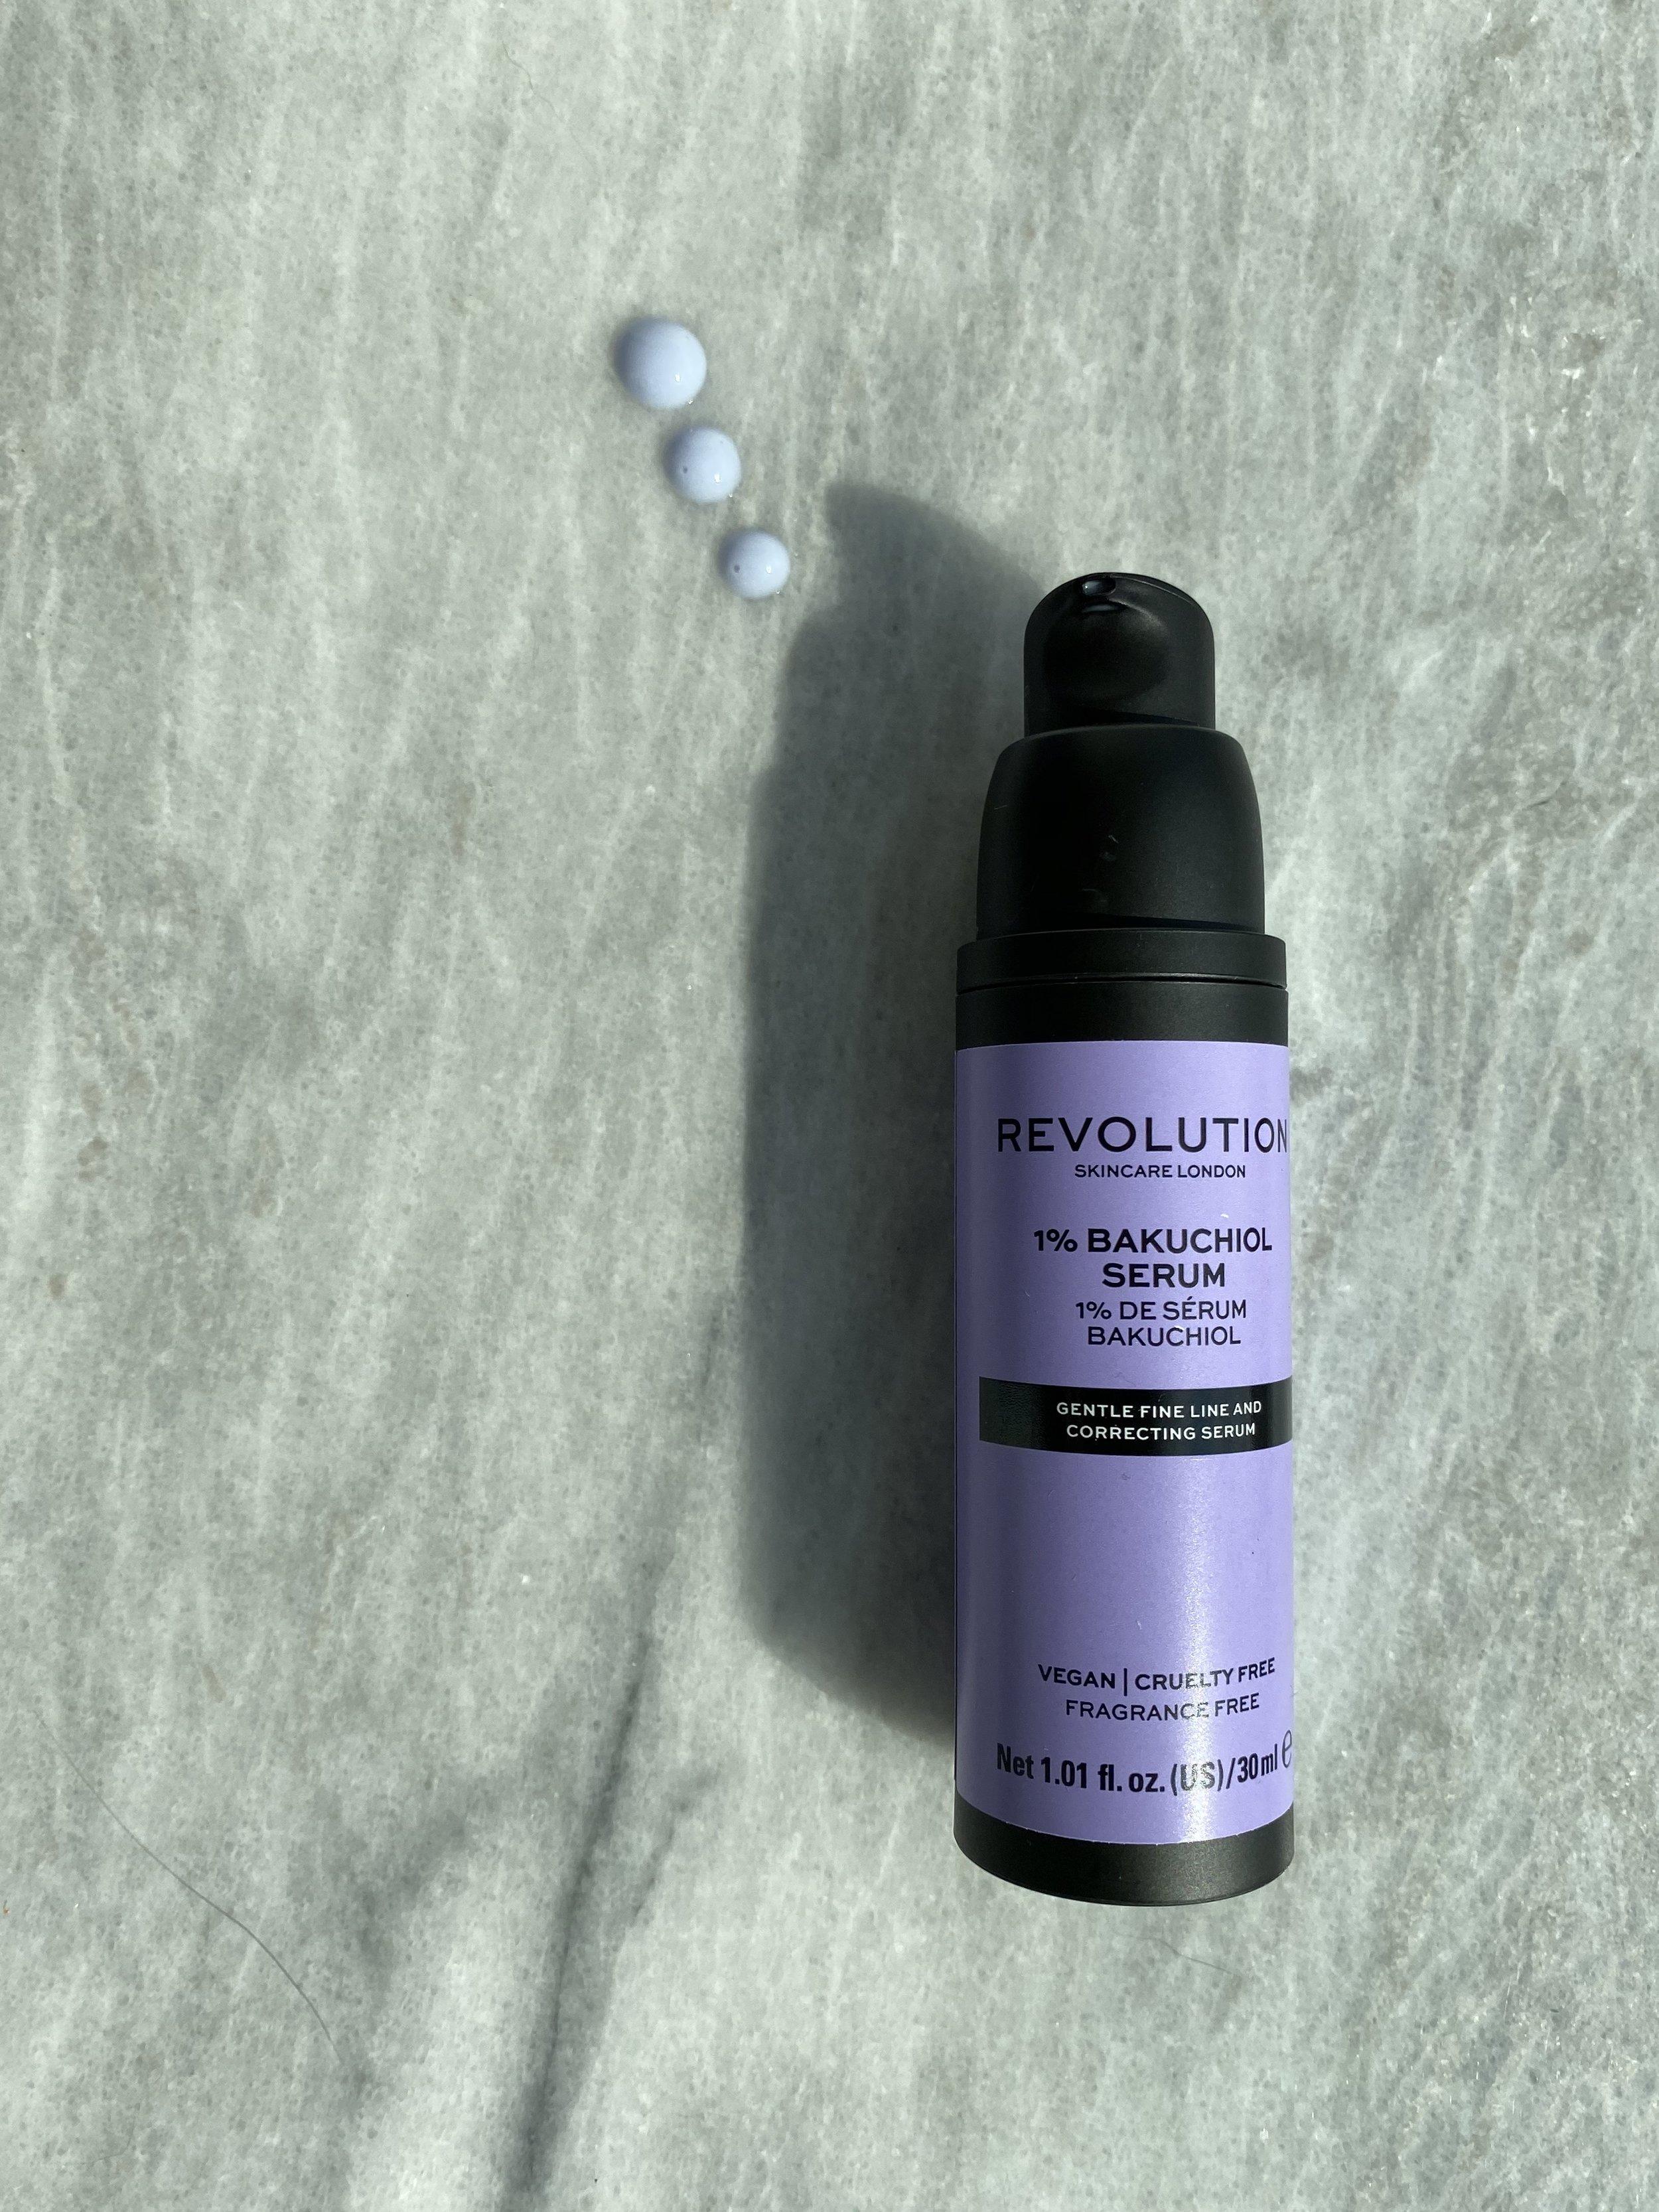 Revolution's 1% Bakuchiol Serum is just $13 for a 1 oz. airless pump